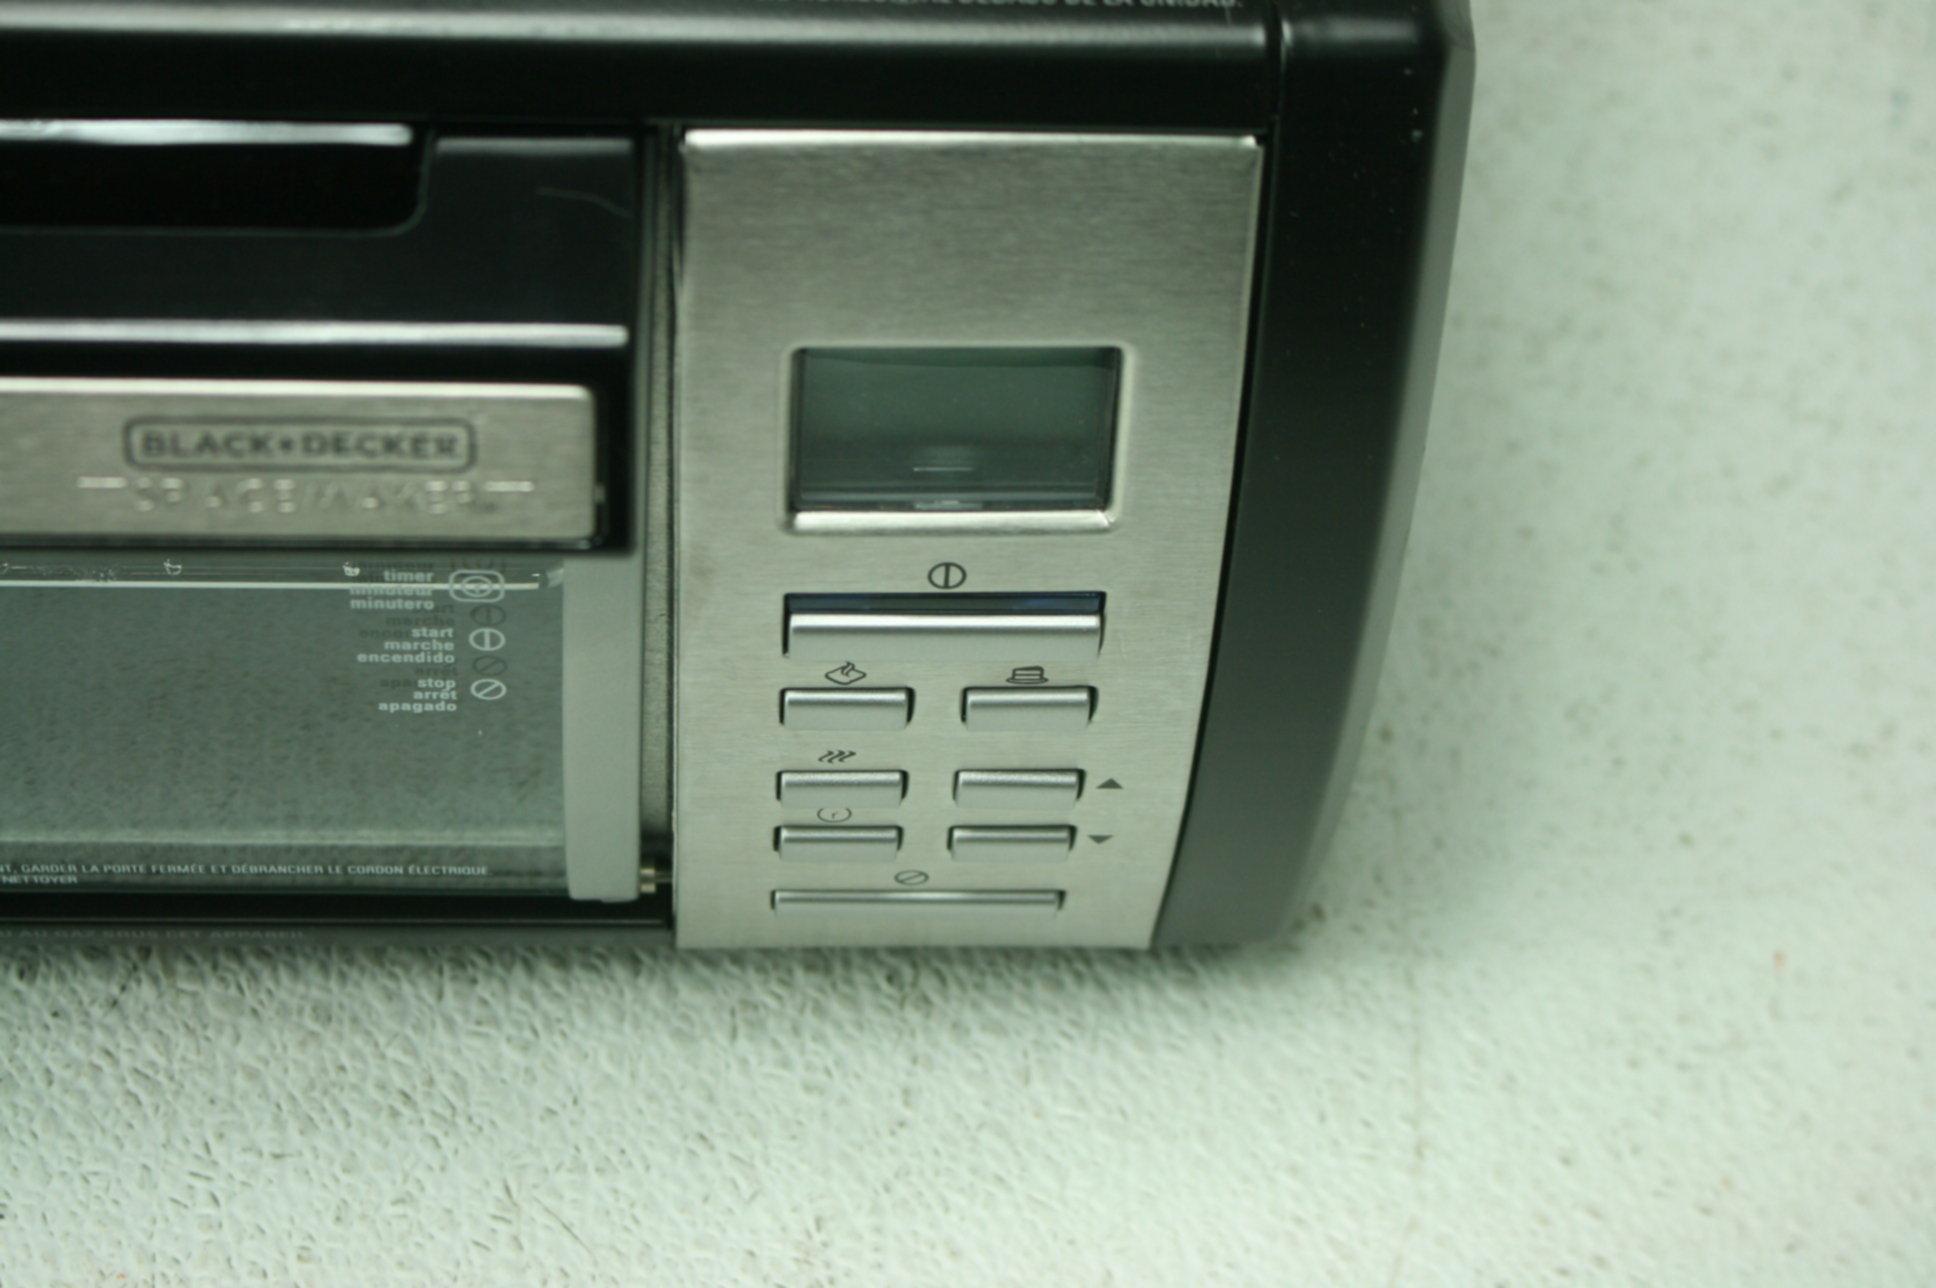 Black Decker Spacemaker Counter Toaster Oven Black